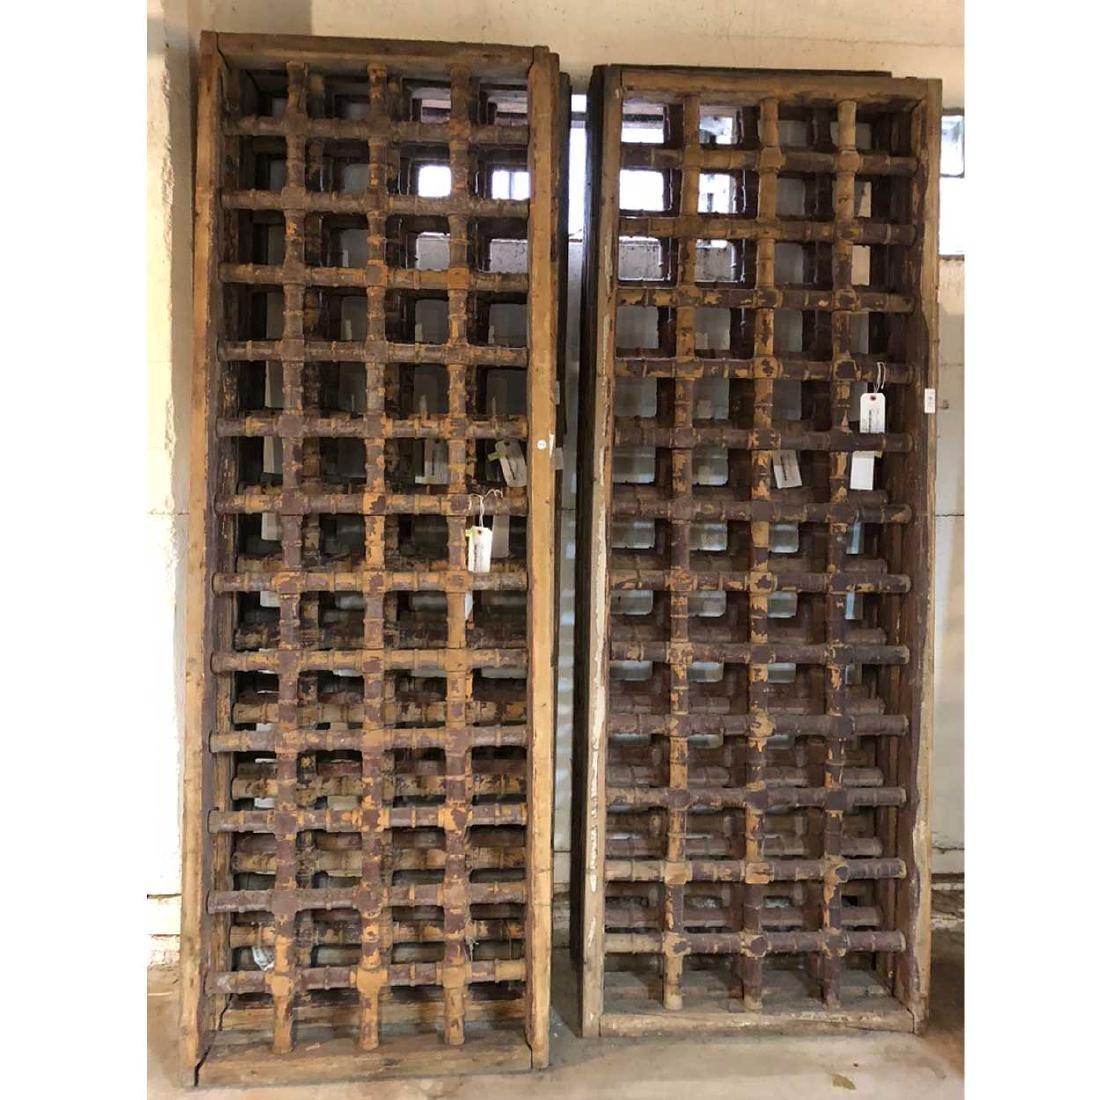 4 Moorish Pine Spindlework Window Grille Panels